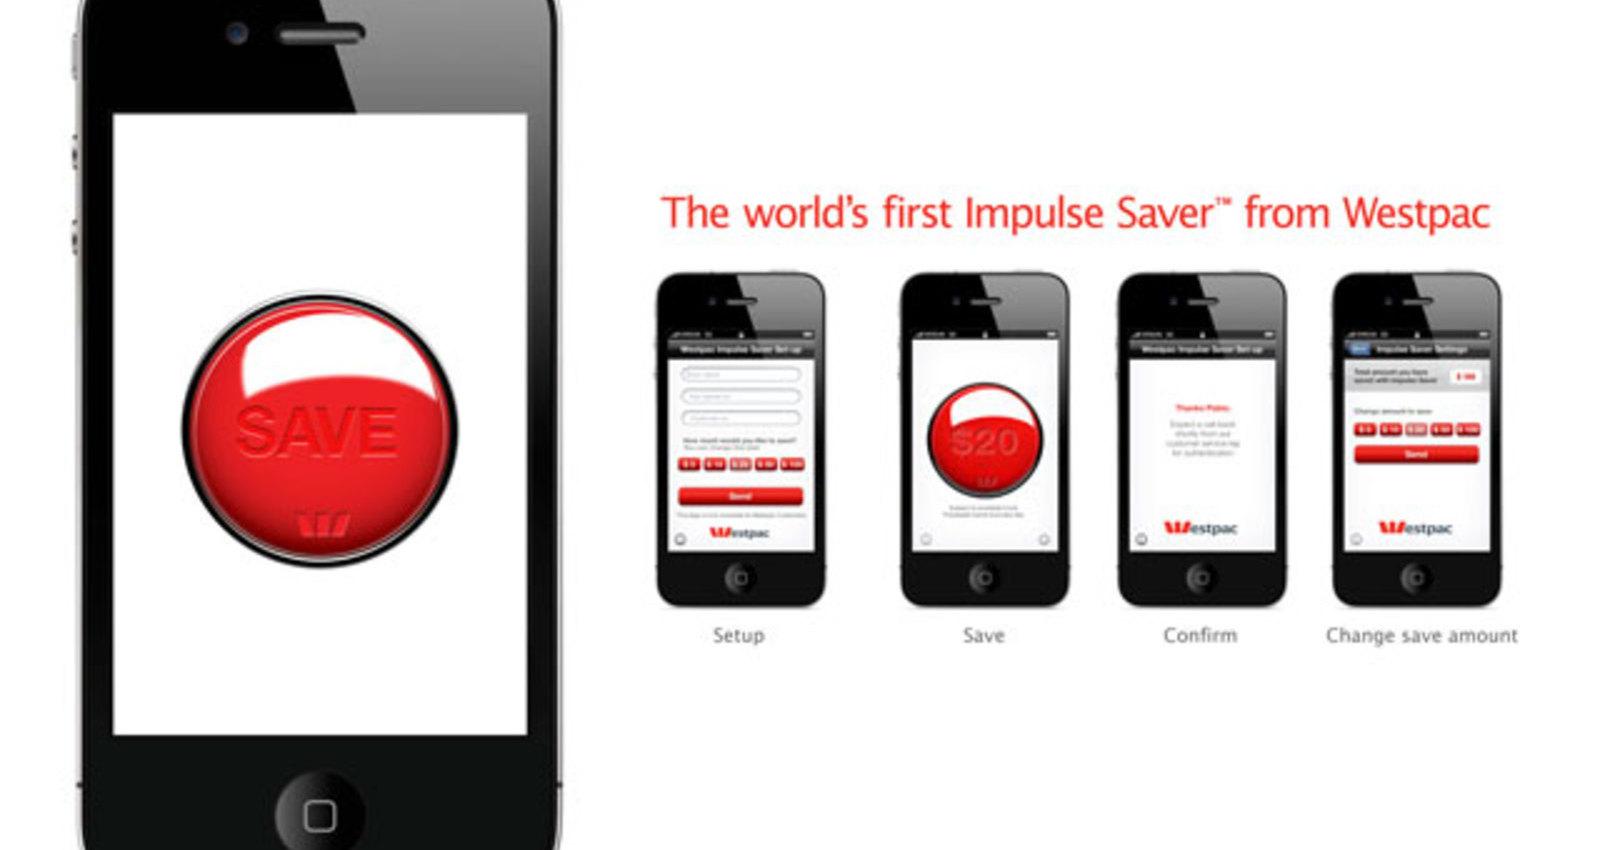 Impulse Saver